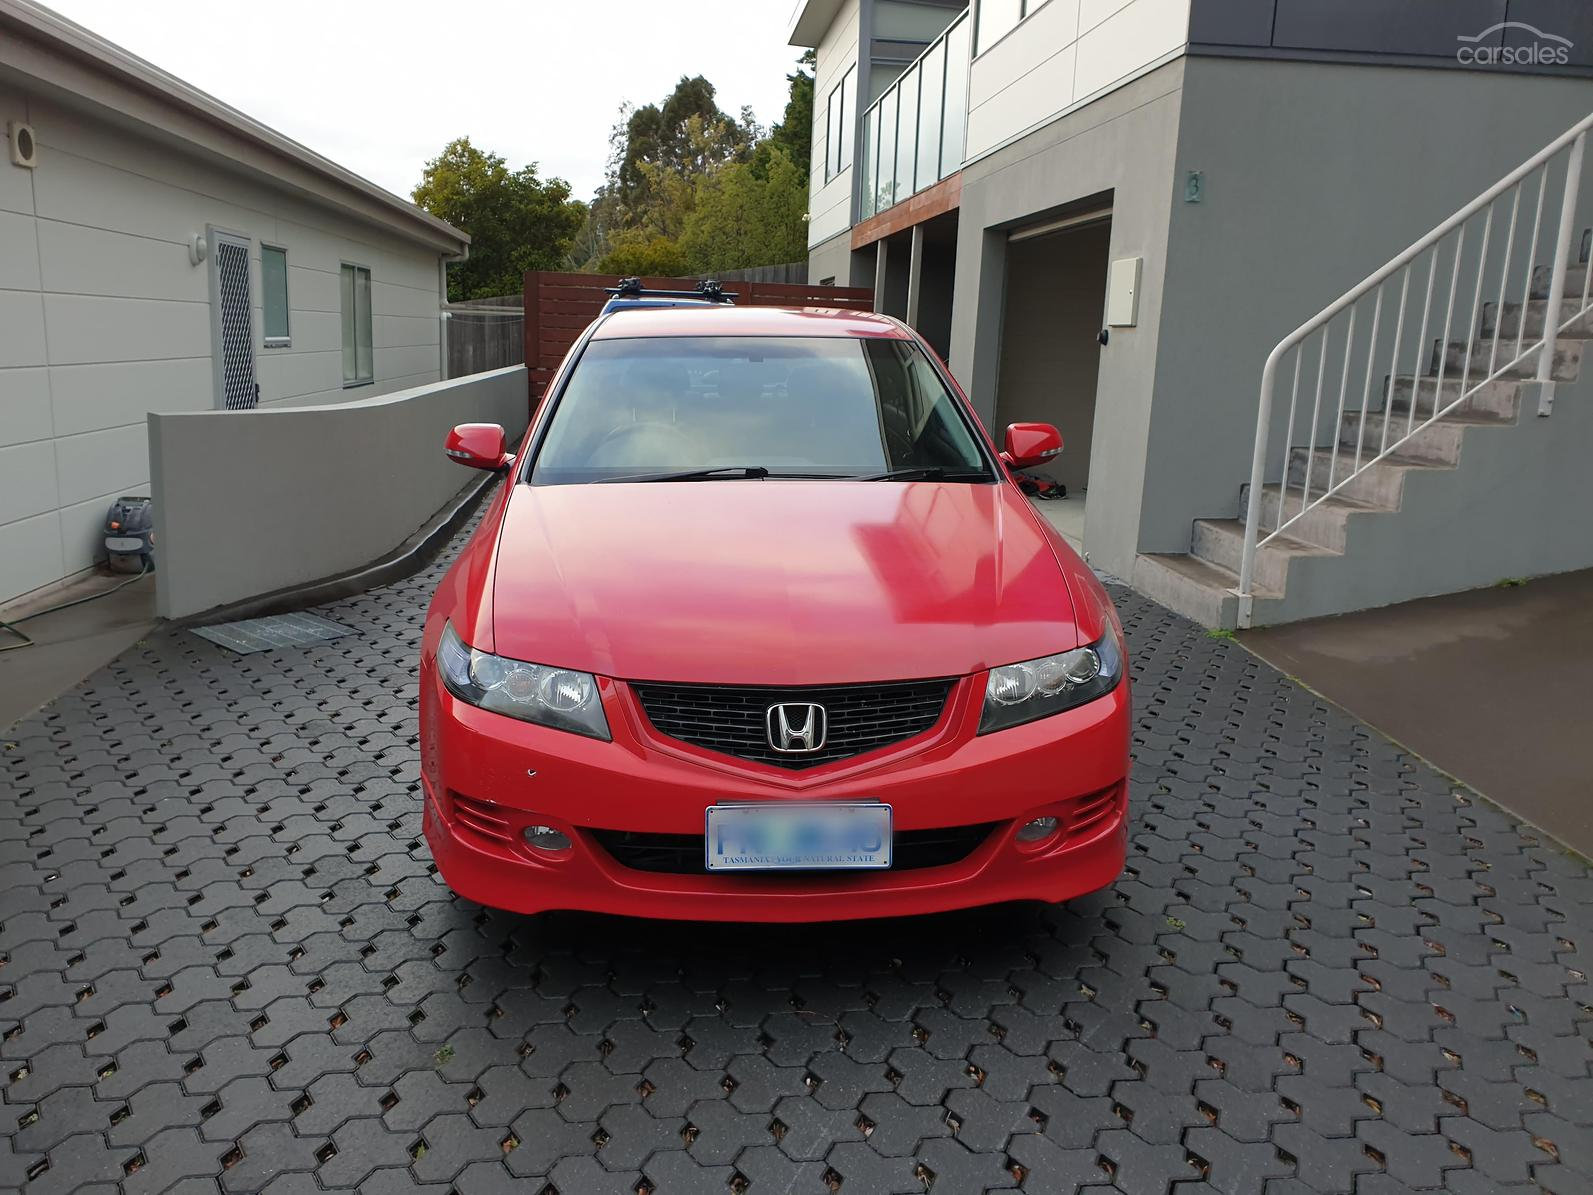 2007 Honda Accord Euro Limited Edition Manual MY07-SSE-AD